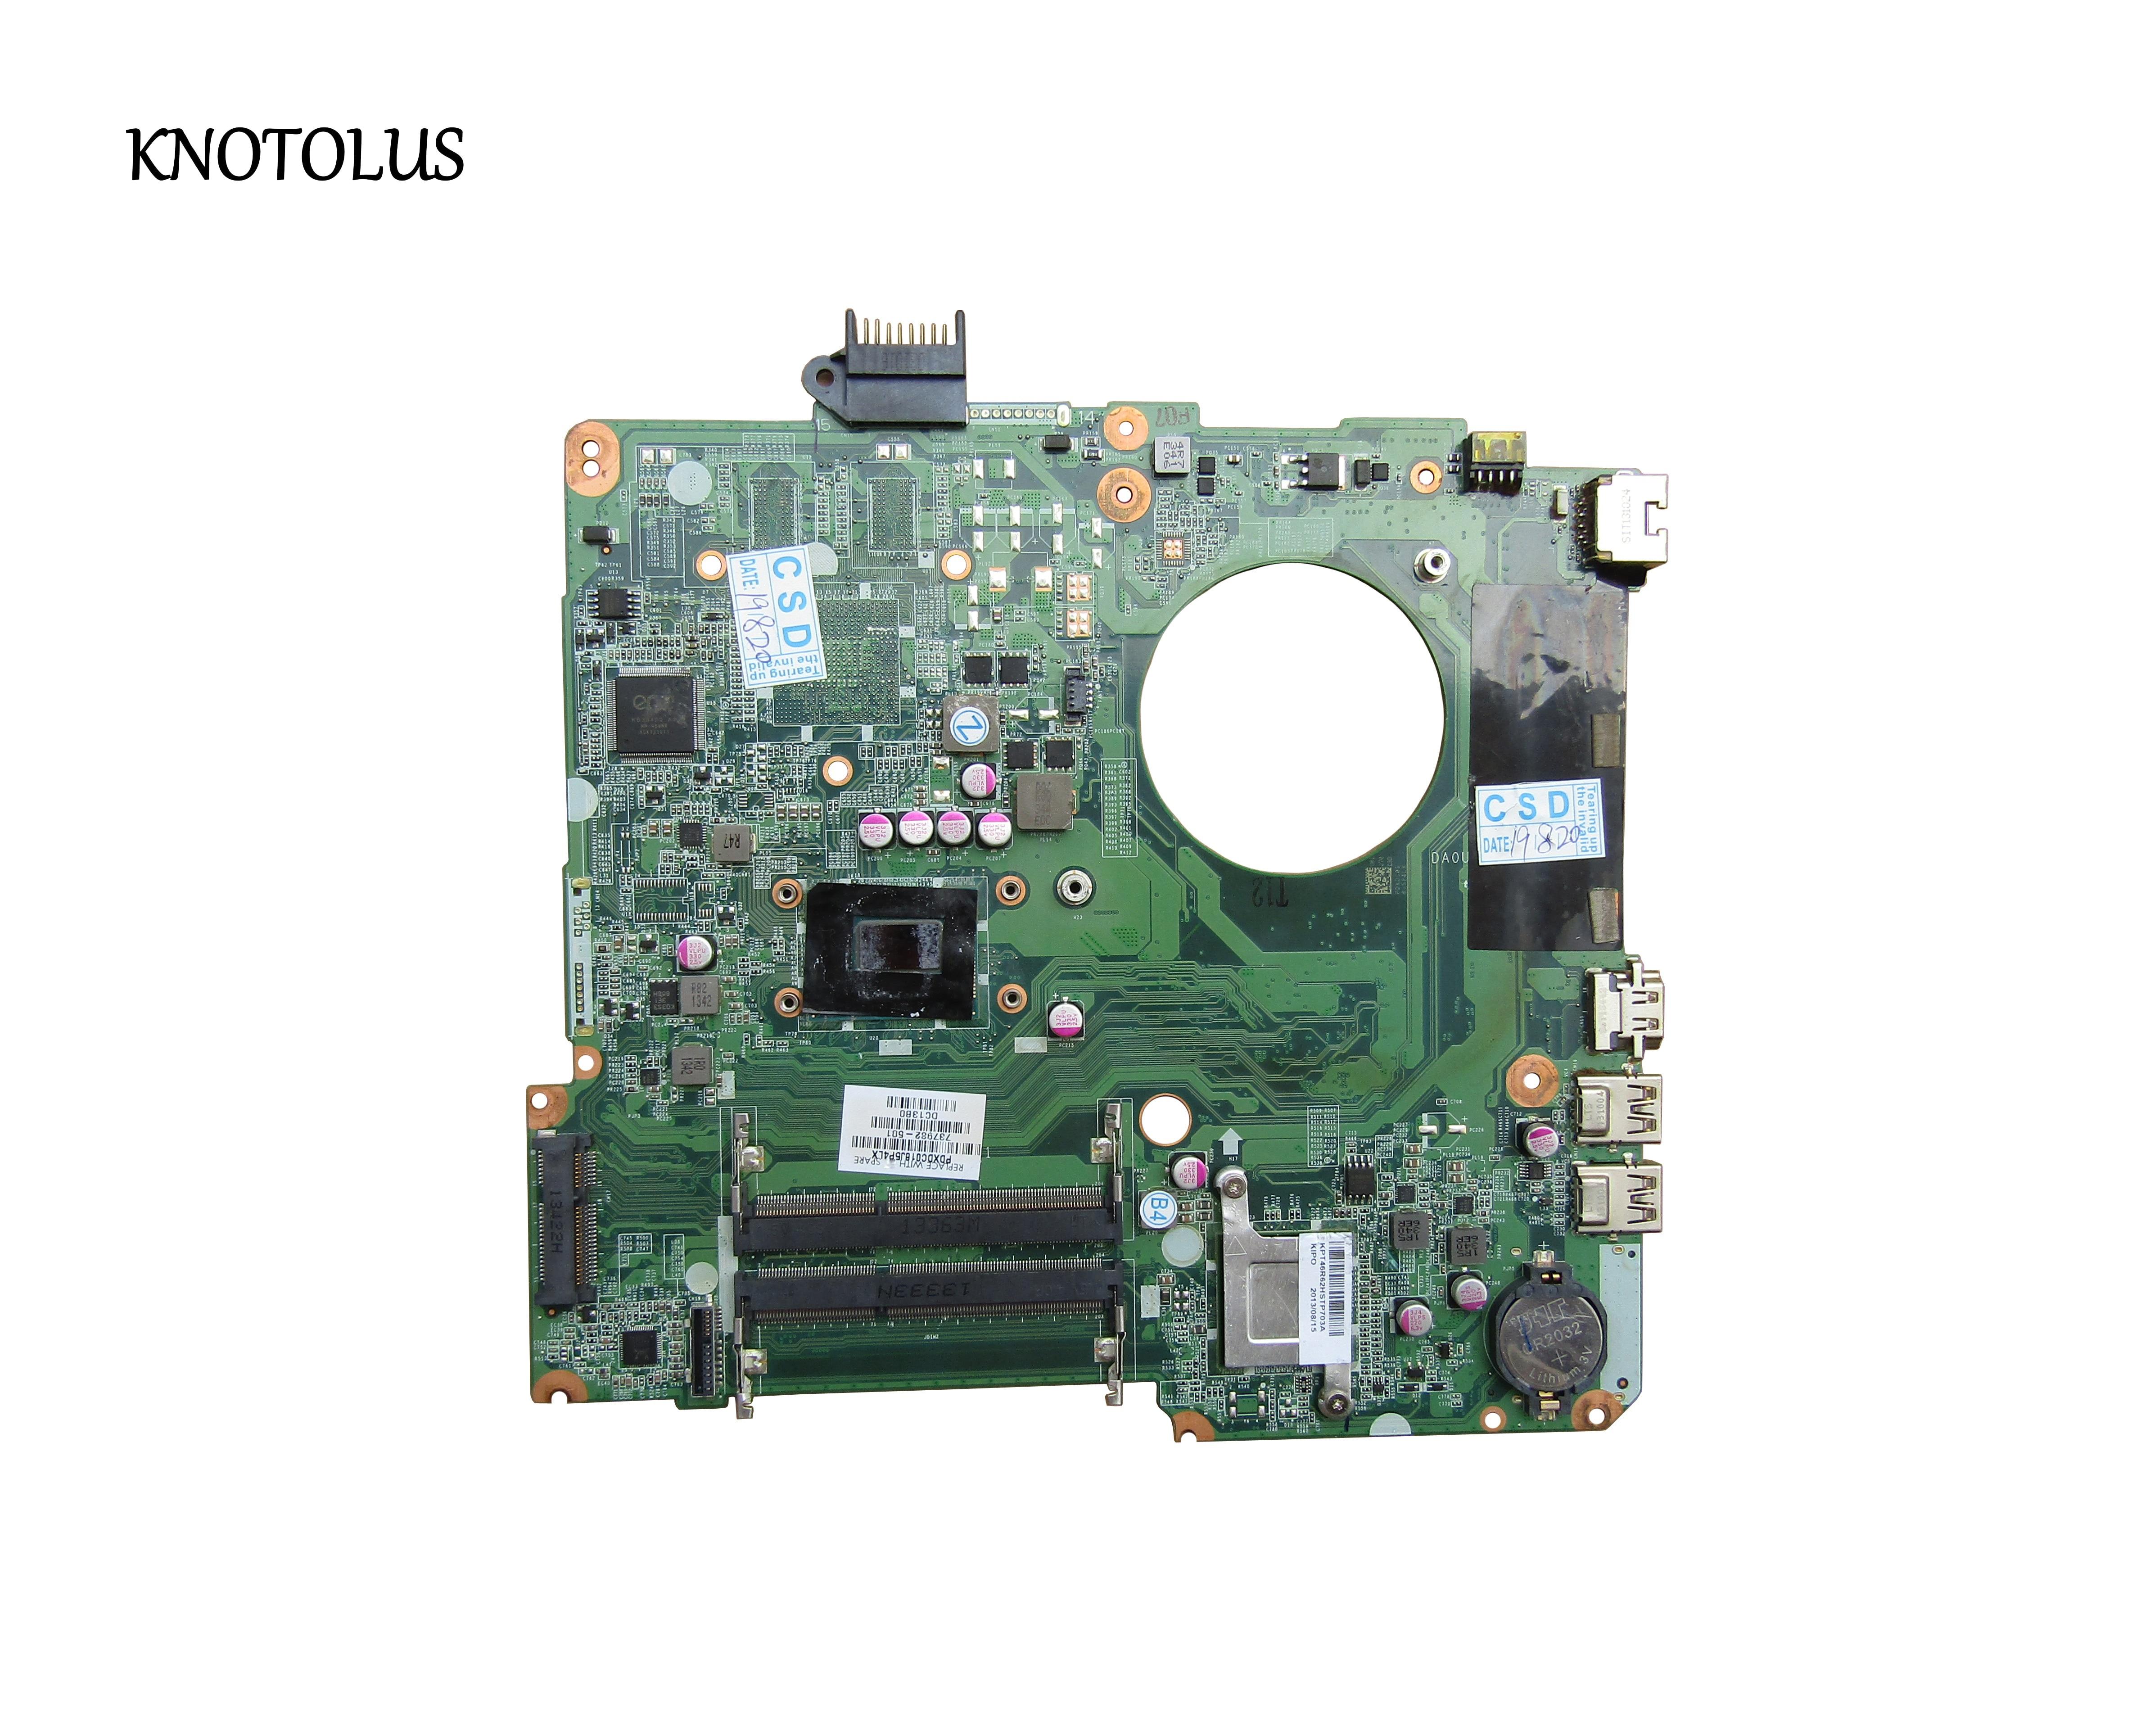 630281-001 placa-mãe para hp dv6 dv6-3000 portátil placa-mãe ddr3 da0lx6mb6h1 da0lx6mb6f2 frete grátis 100% teste ok